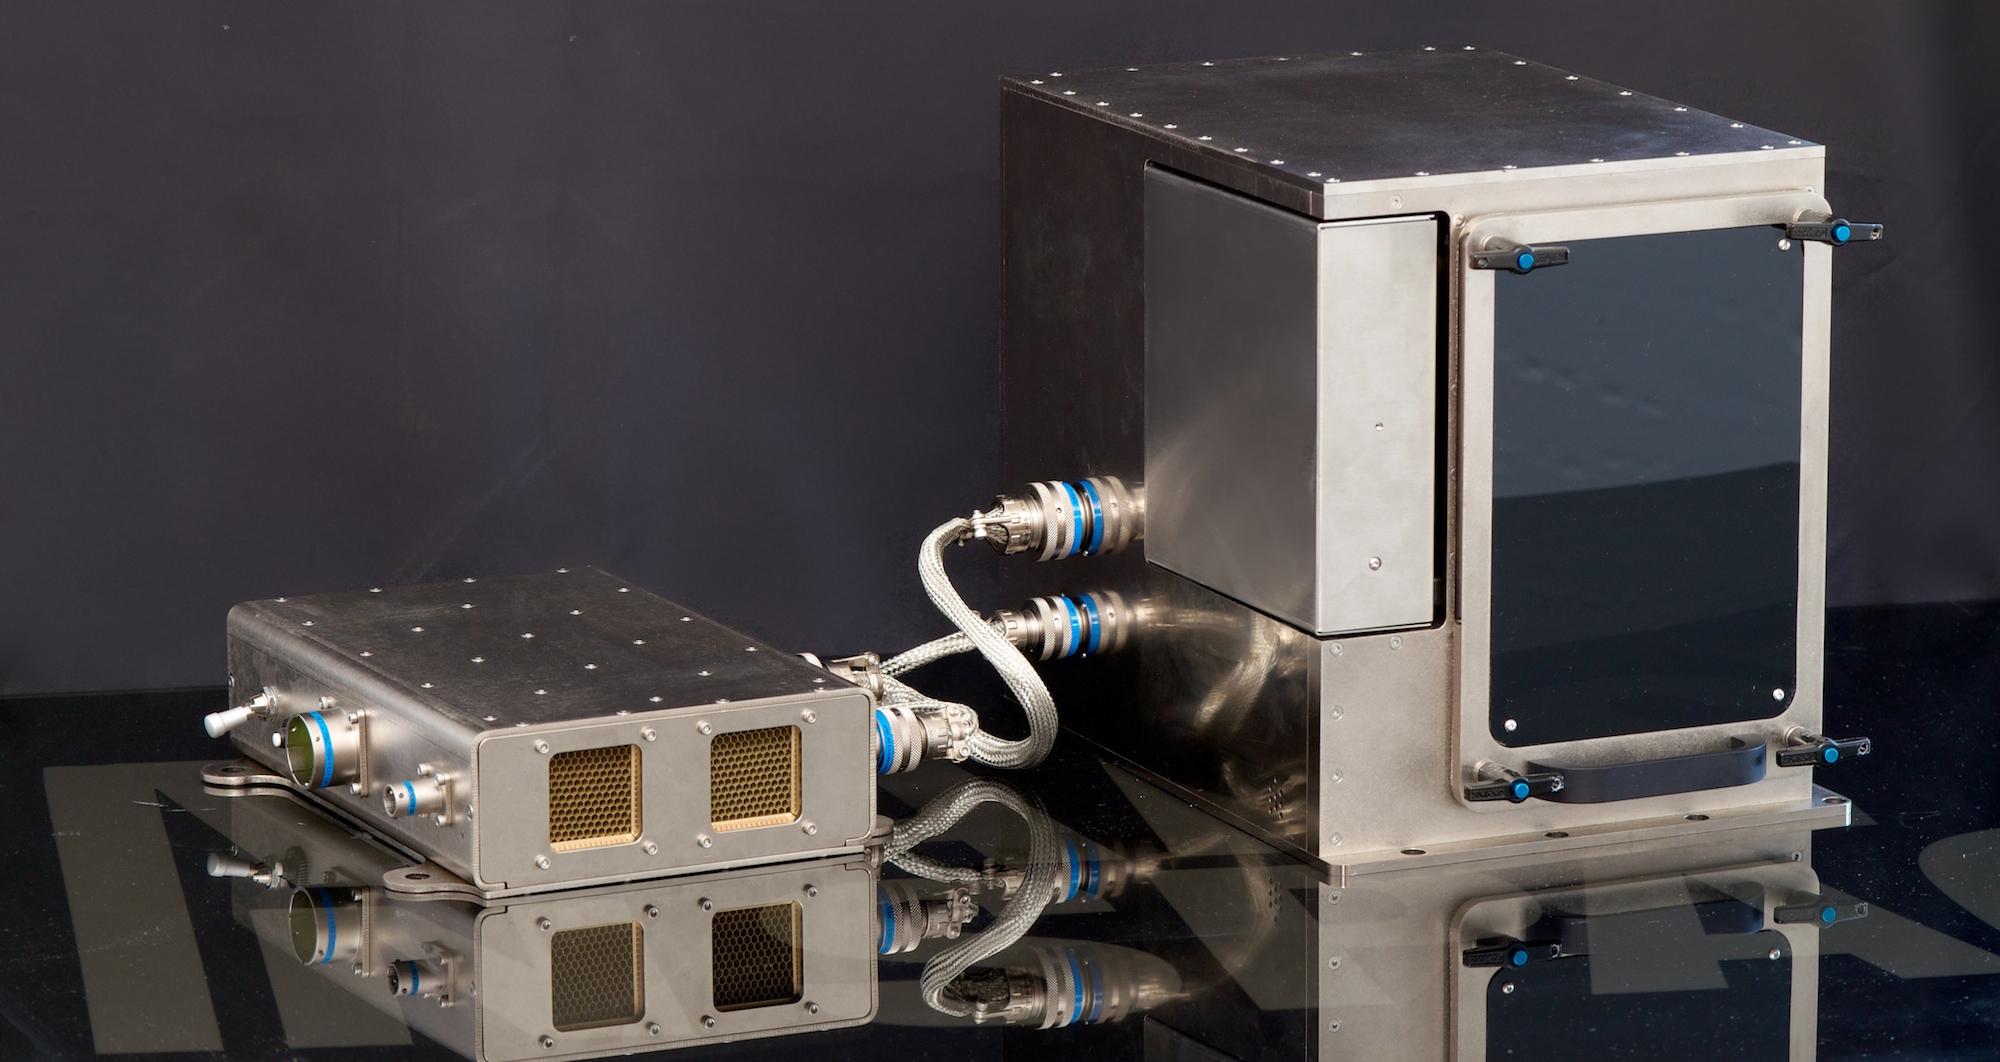 Space 3d Printer 3d Printer